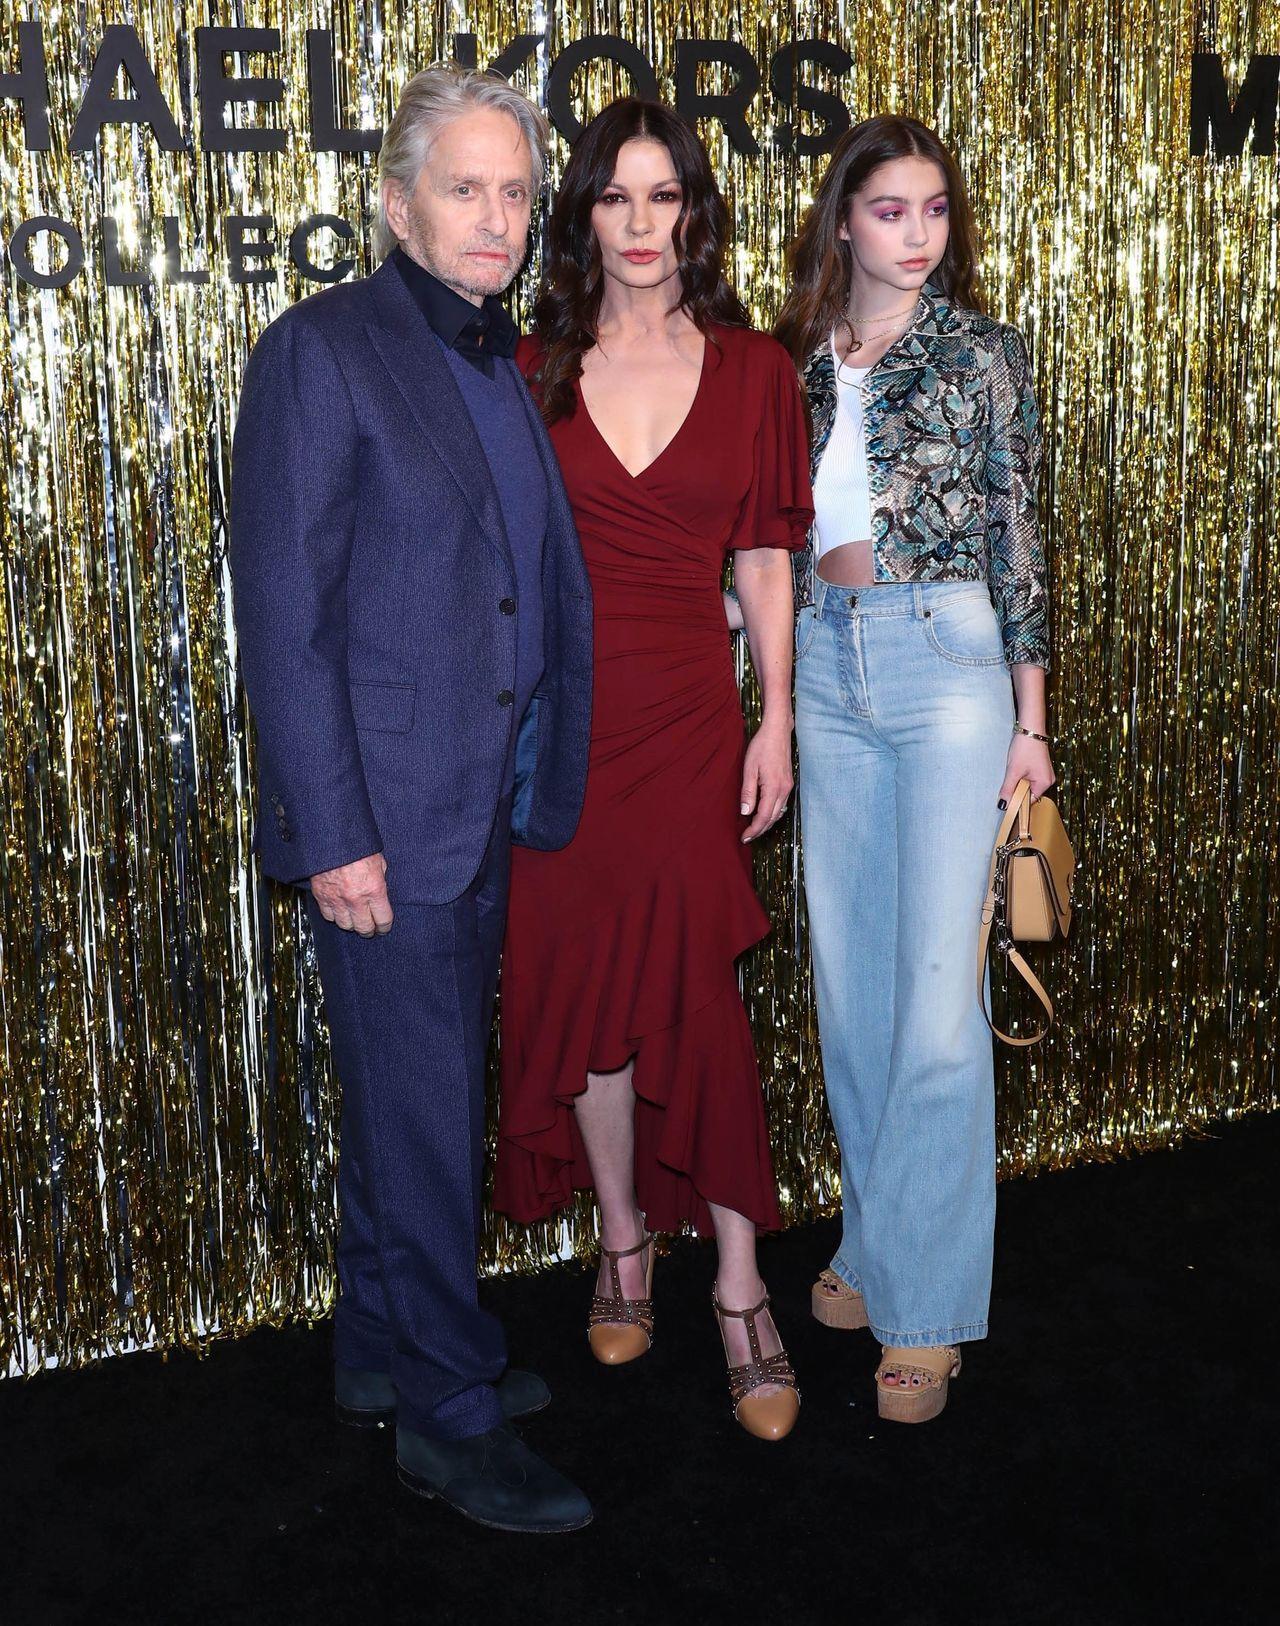 Celebrities at Michael Kors Fashion Show / STARMAX / BACKGRID , kod: 14163-14163-1